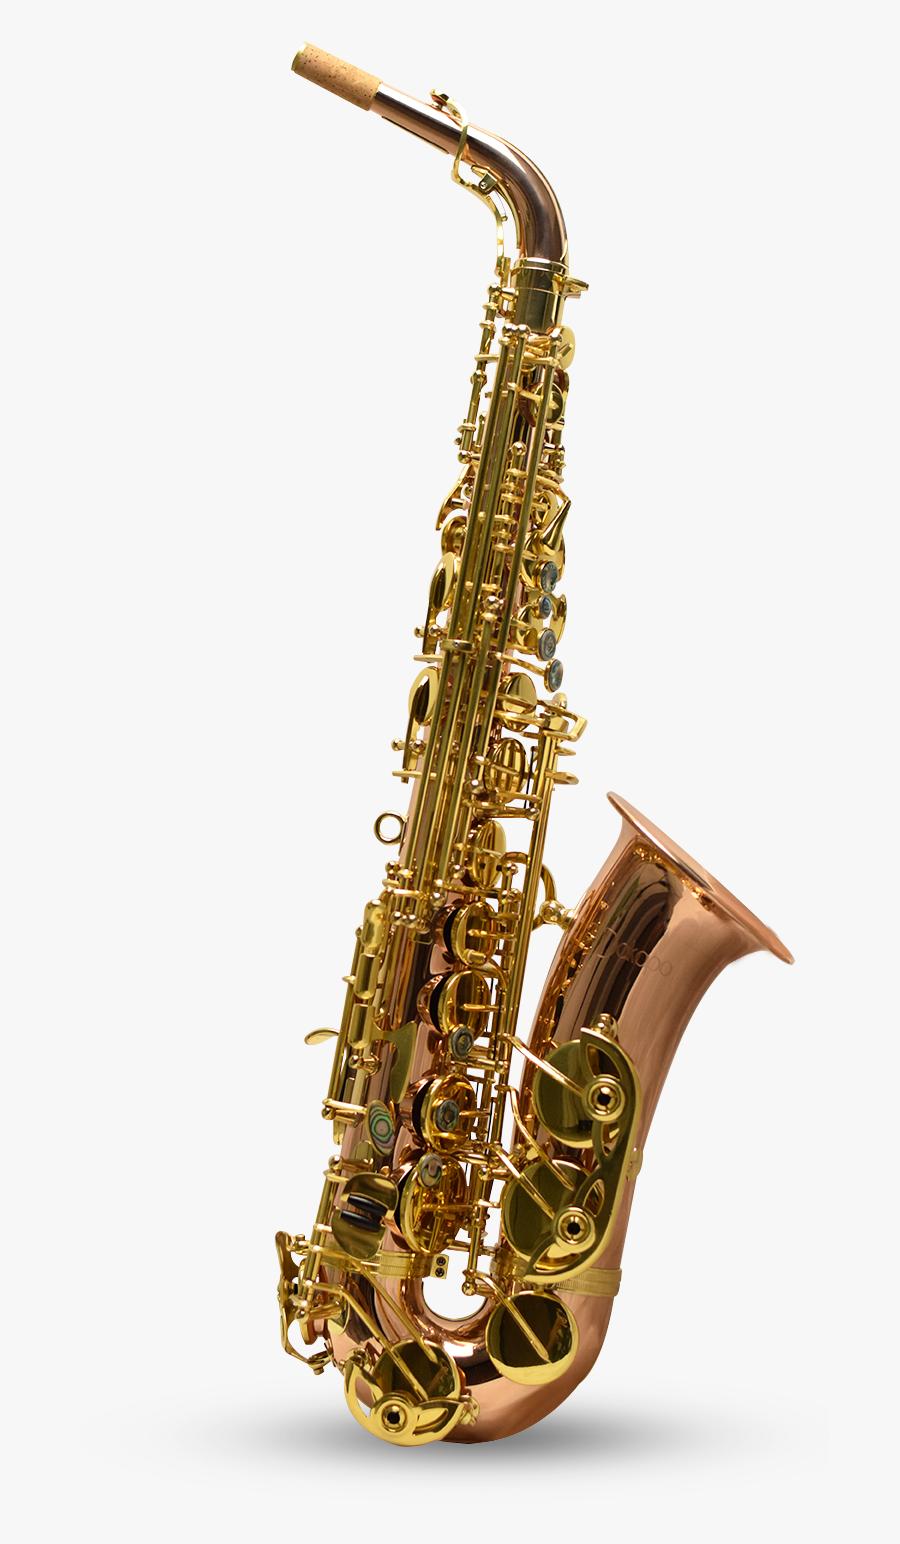 Clip Art Sax De Ouro - Saxofone Alto Fotos De Saxofone, Transparent Clipart